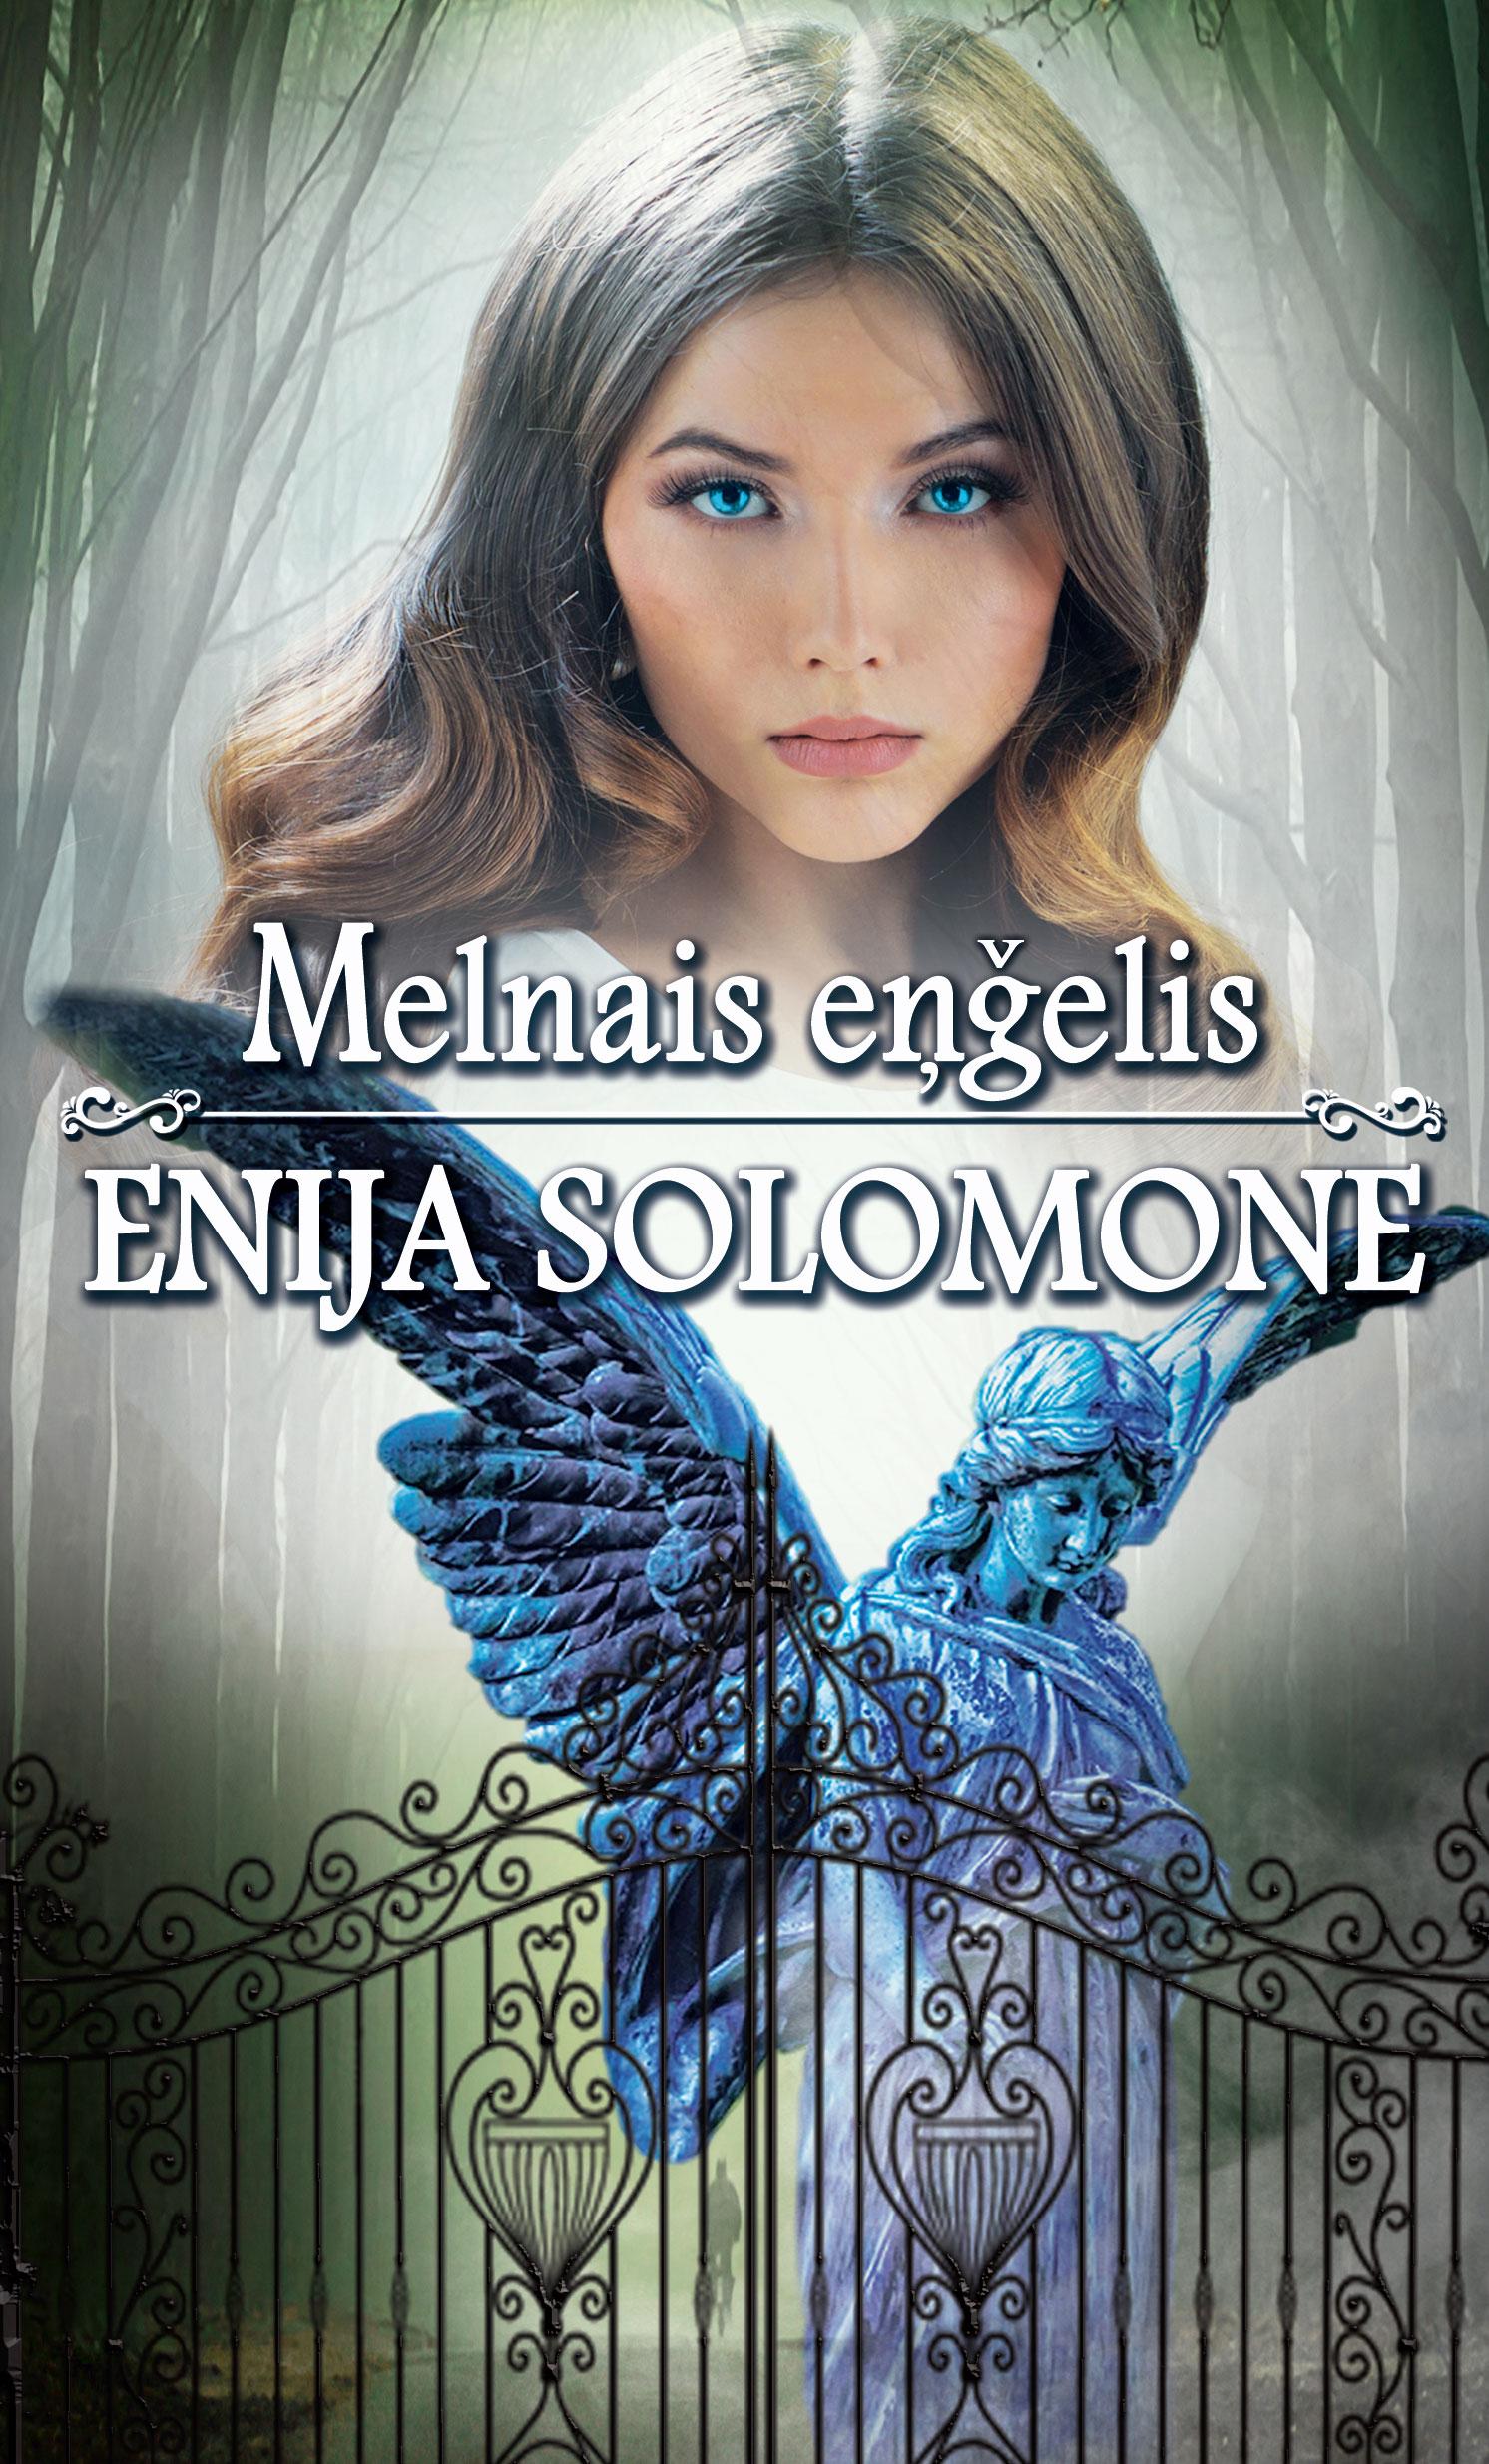 Enija Solomone Melnais eņģelis gina viegliņa valliete atradene un eņģelis page 4